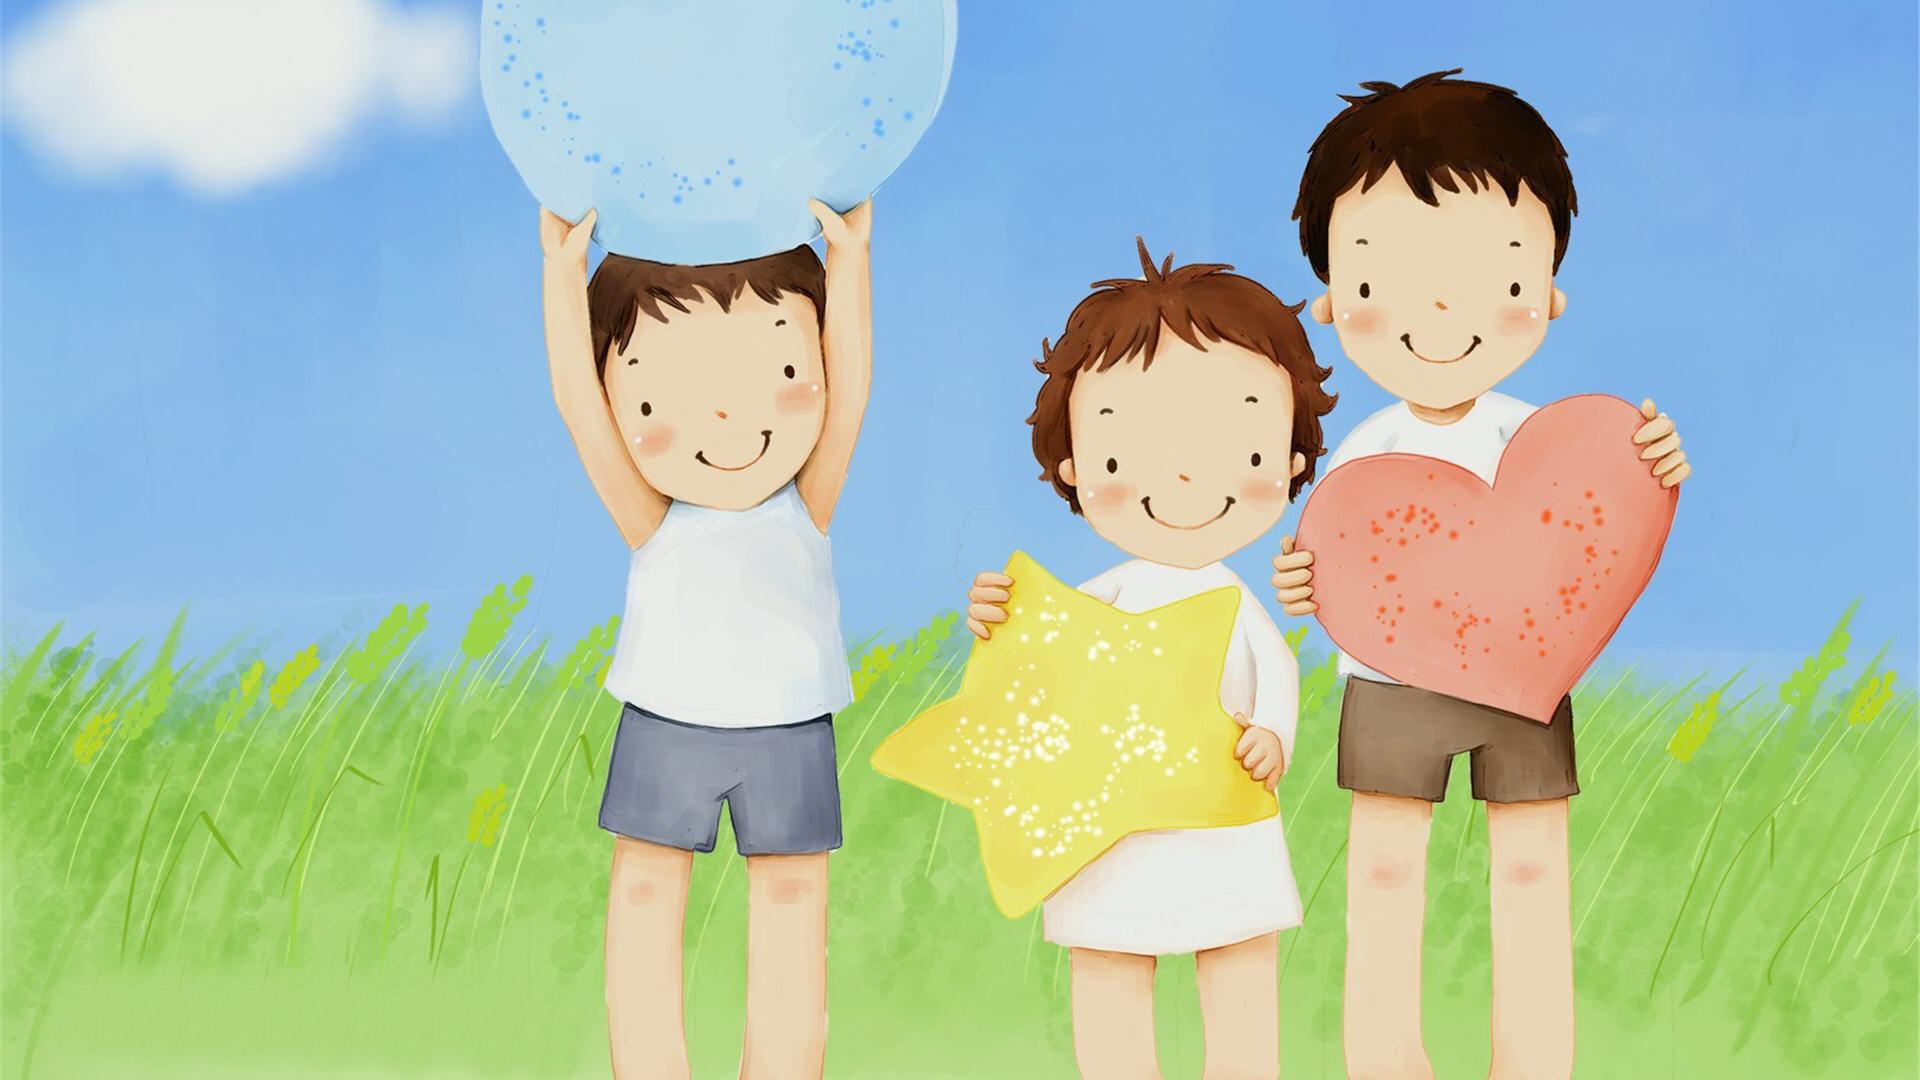 Children Wallpaper 1920x1080 60973